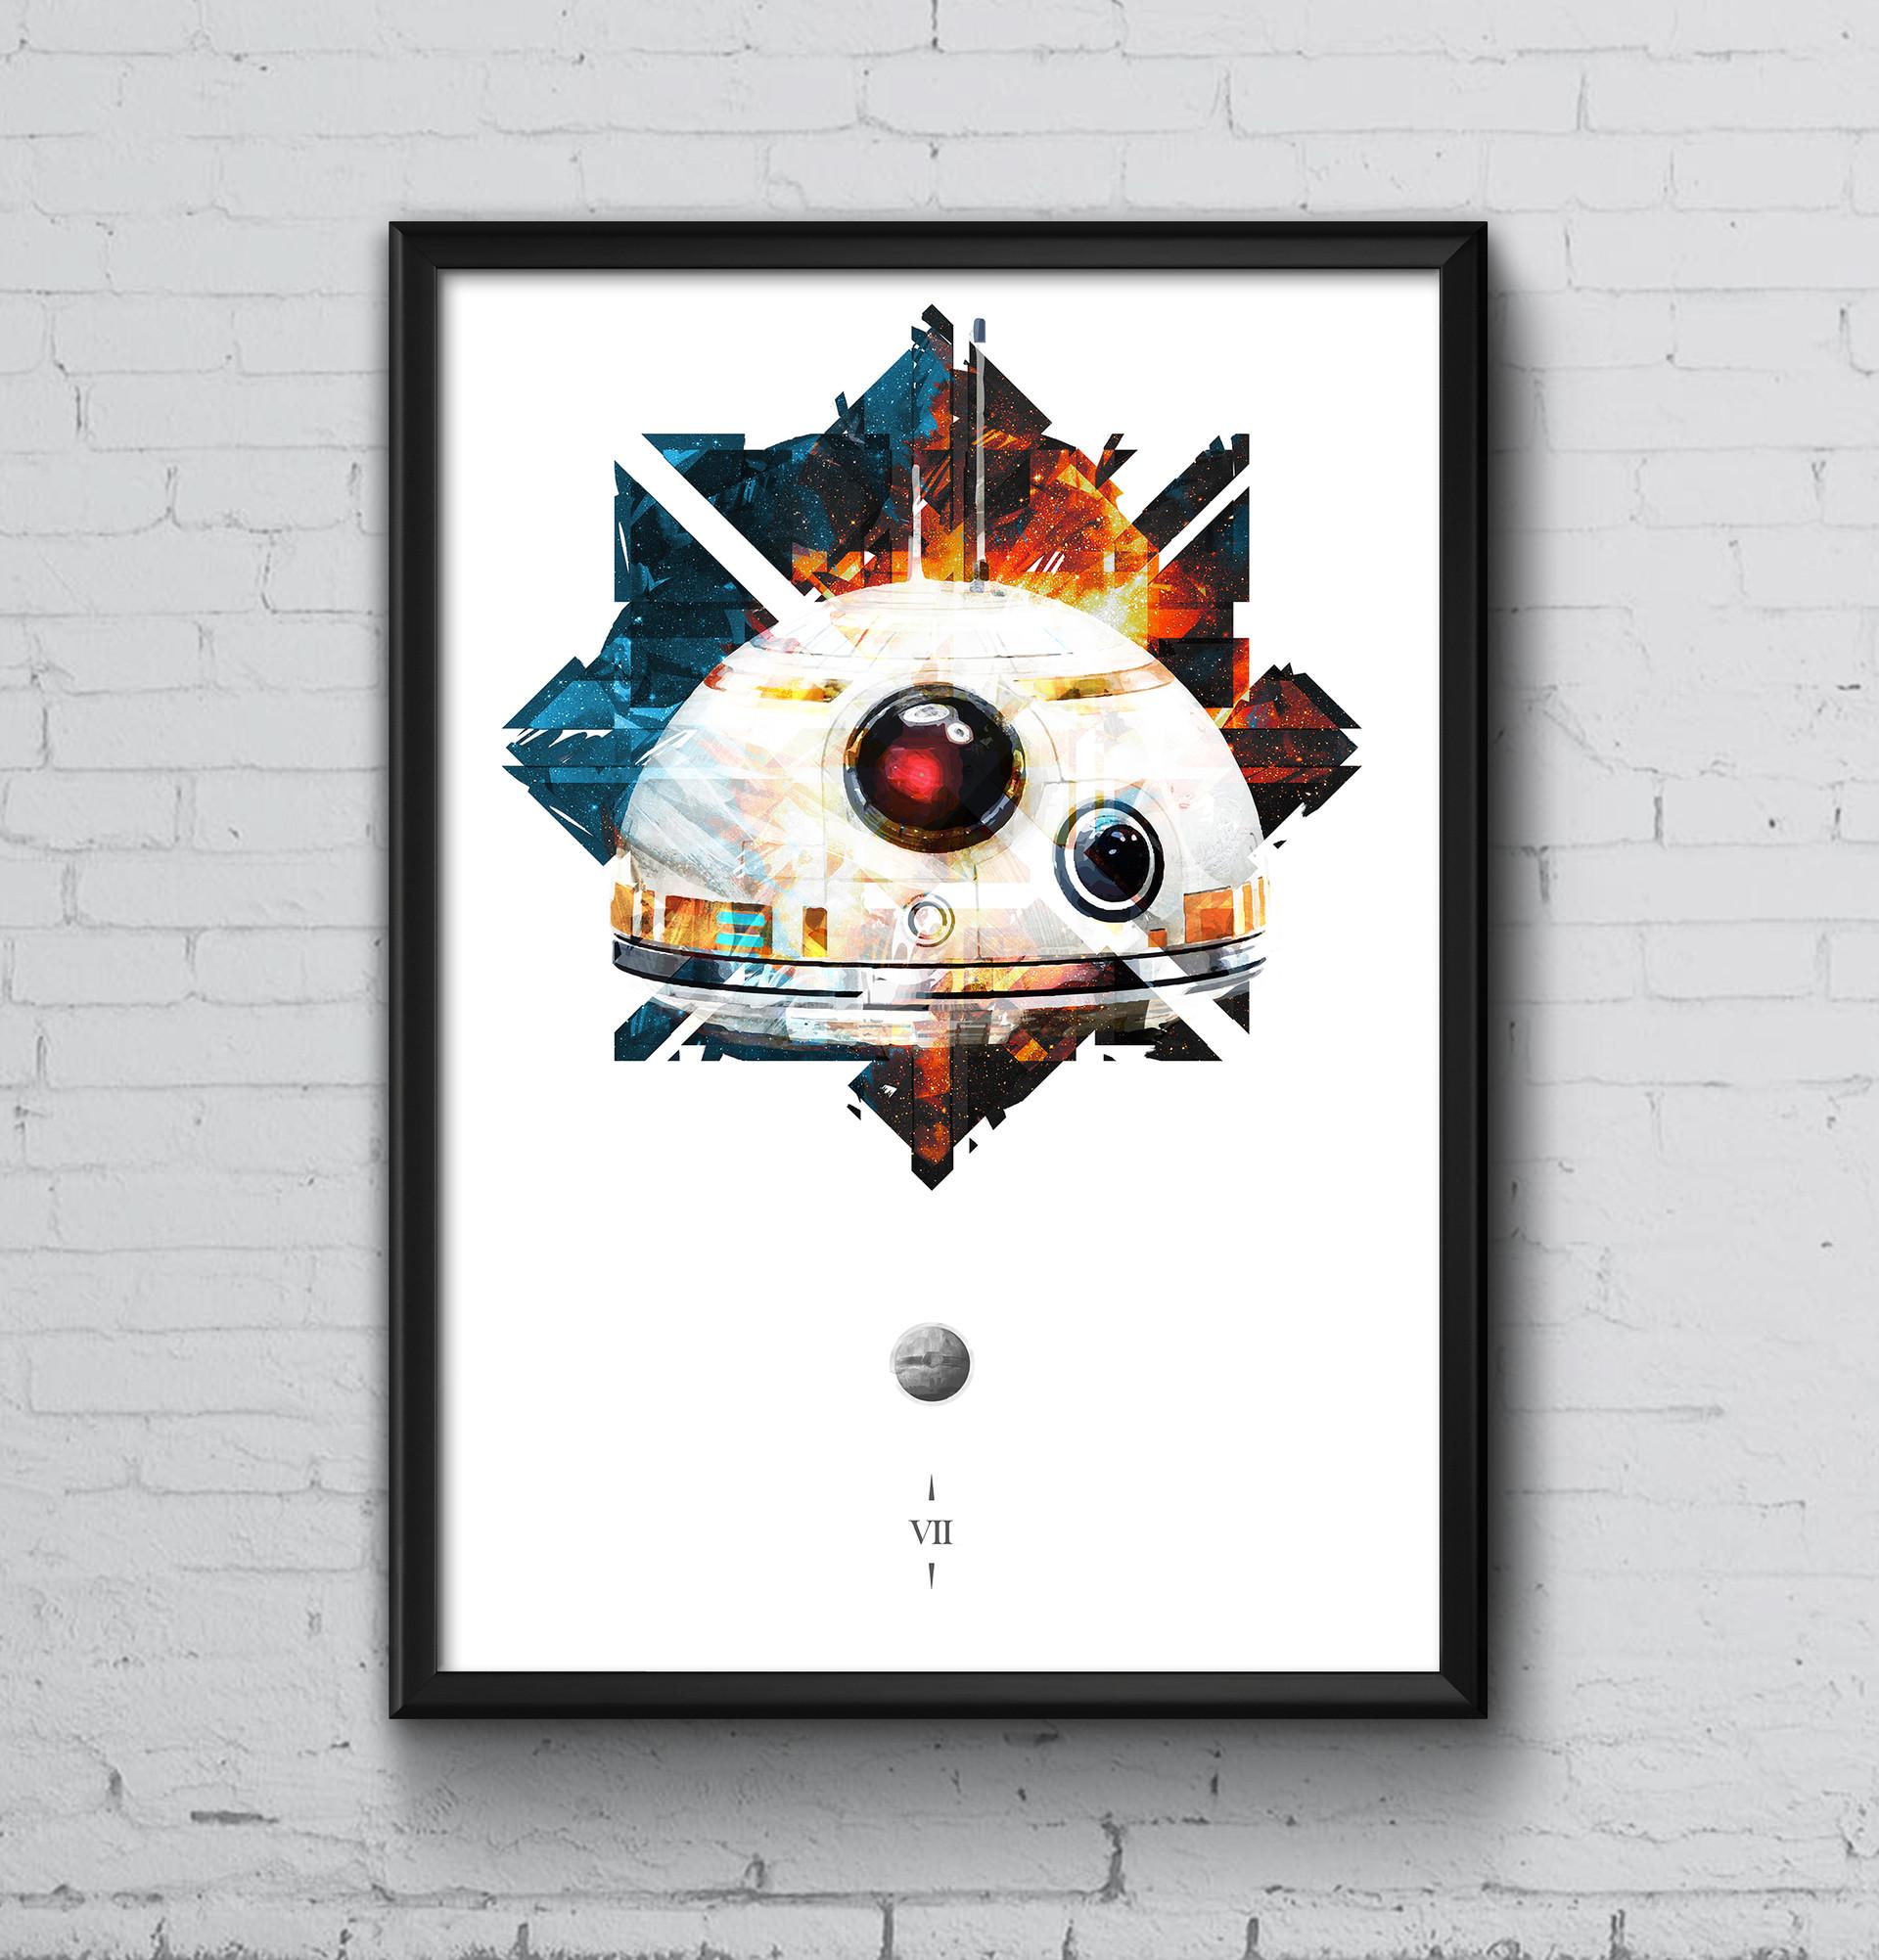 Callum whitehead poster frame psd mockup starwars